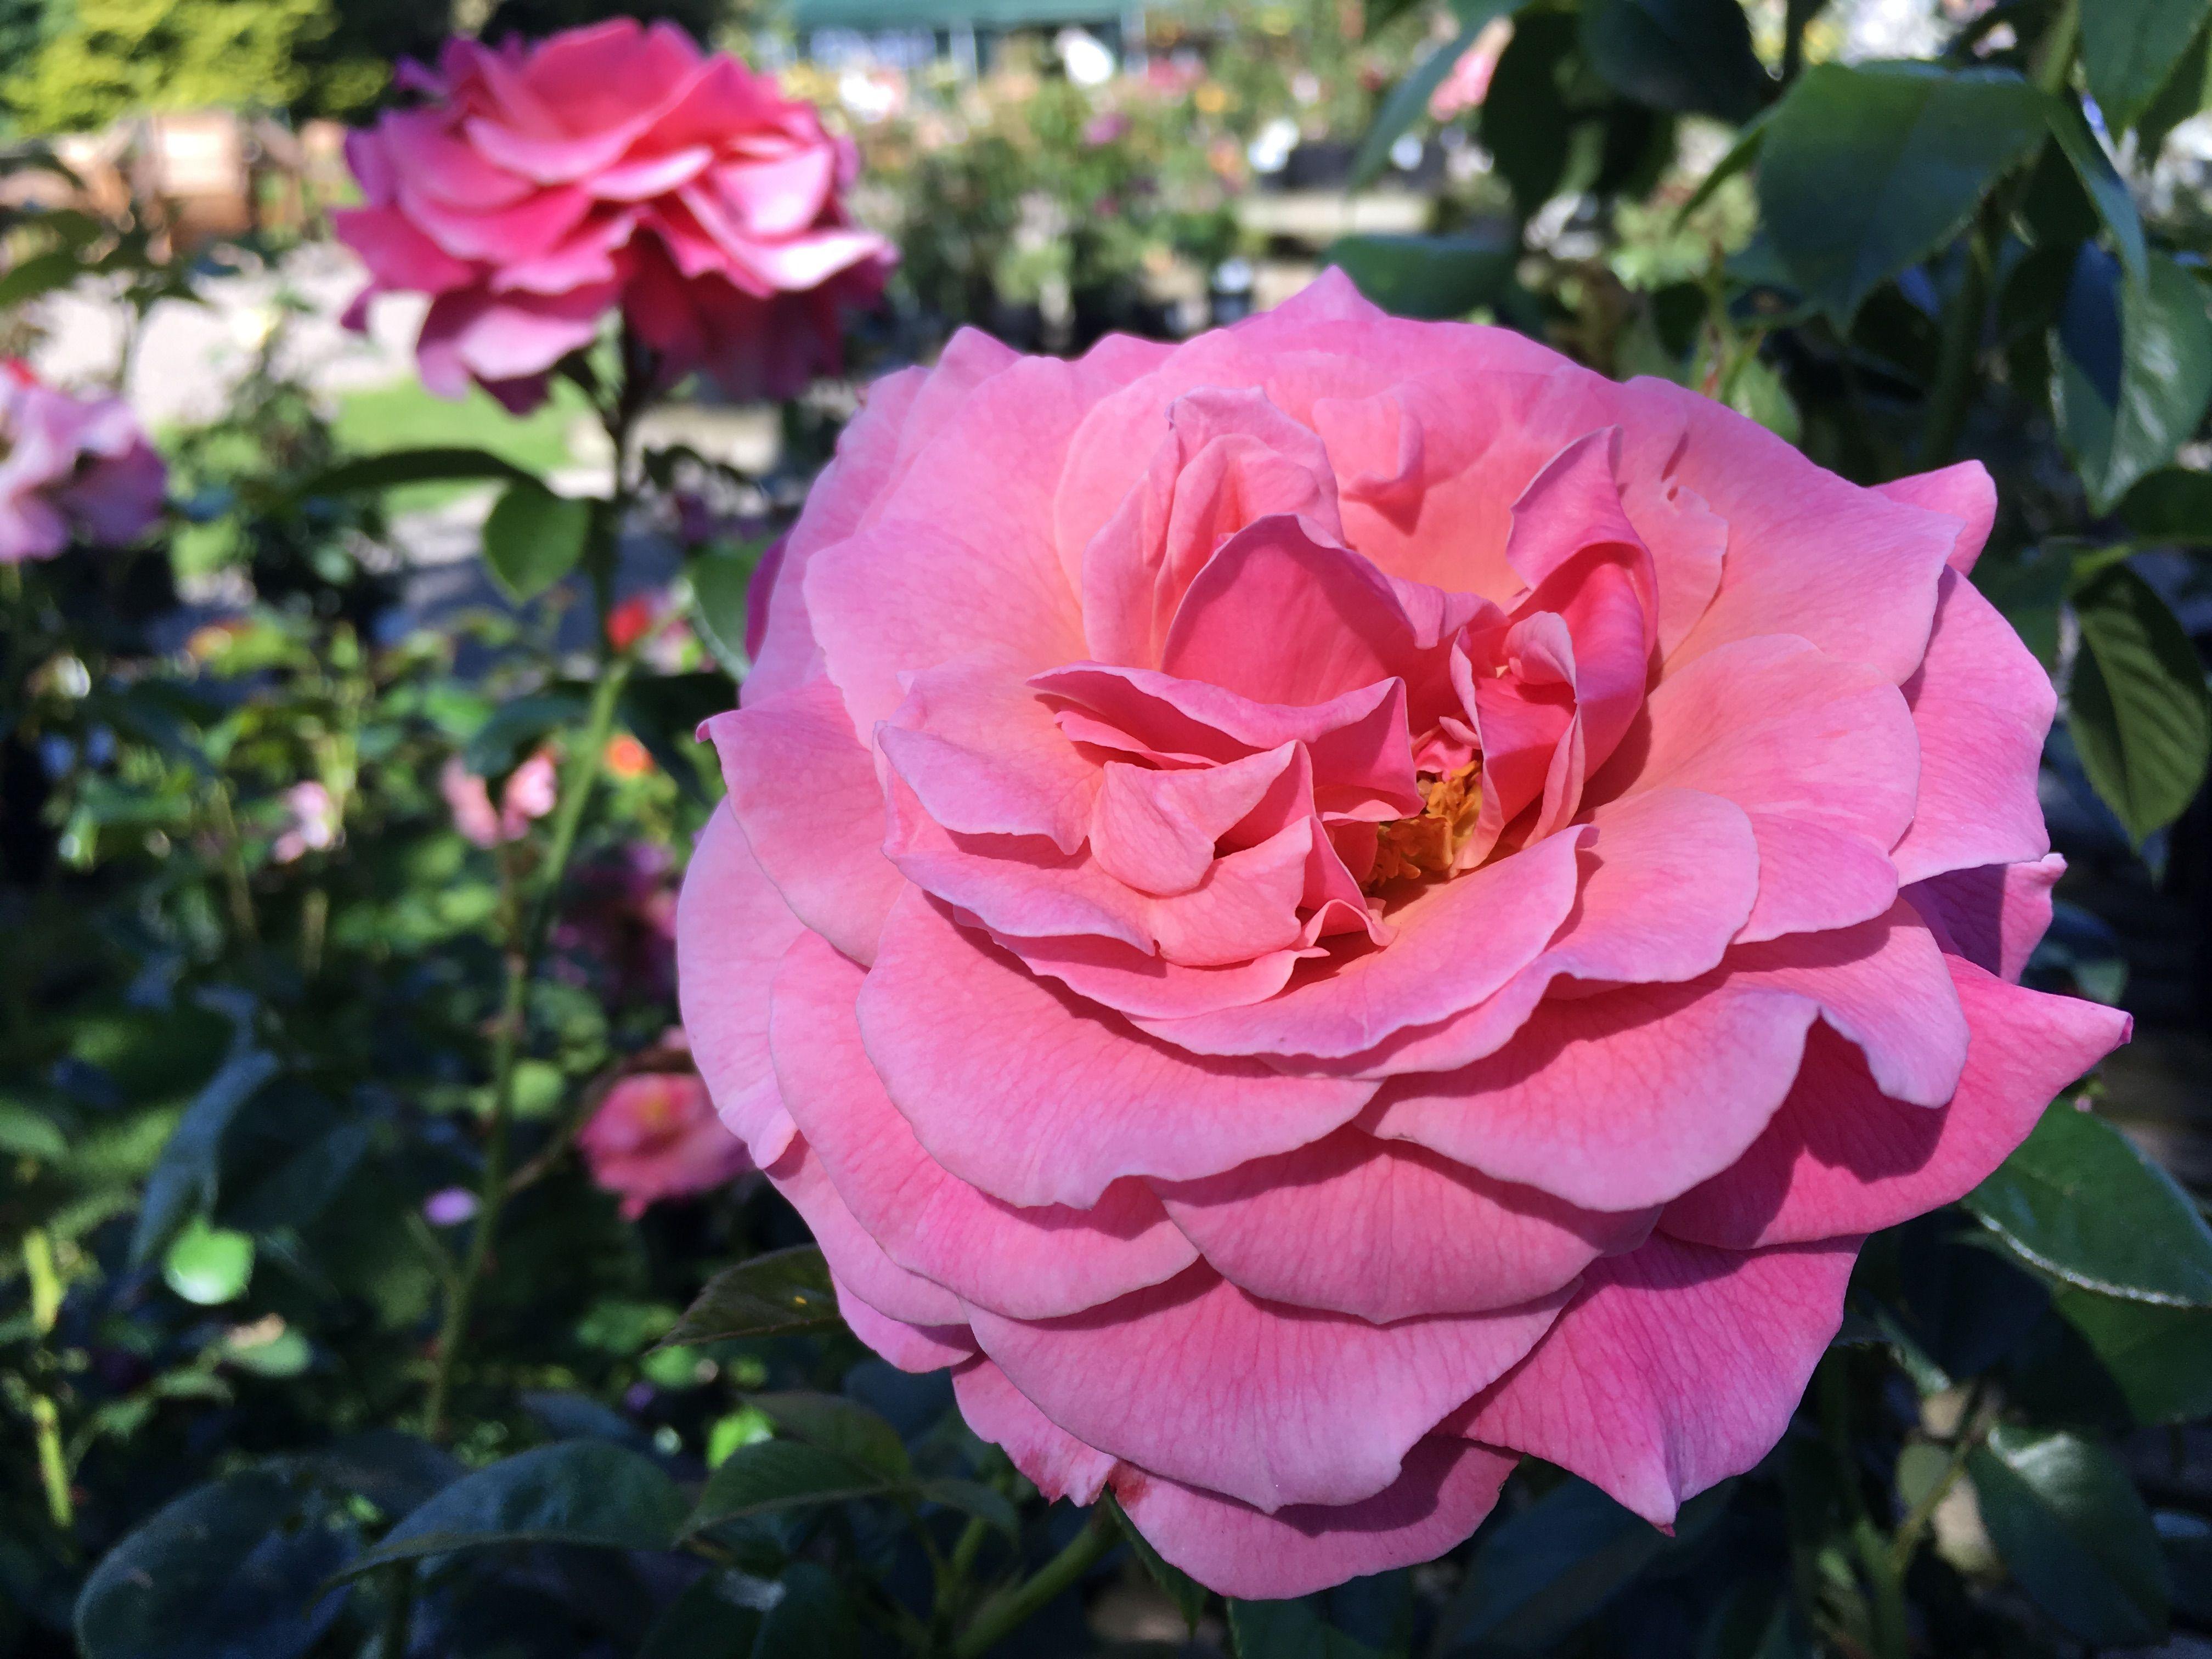 Tickled Pink A Floribunda Rose Growing 2 3 Ft Gold Standard Award Winner 2007 Rose Pink Roses Growing Roses